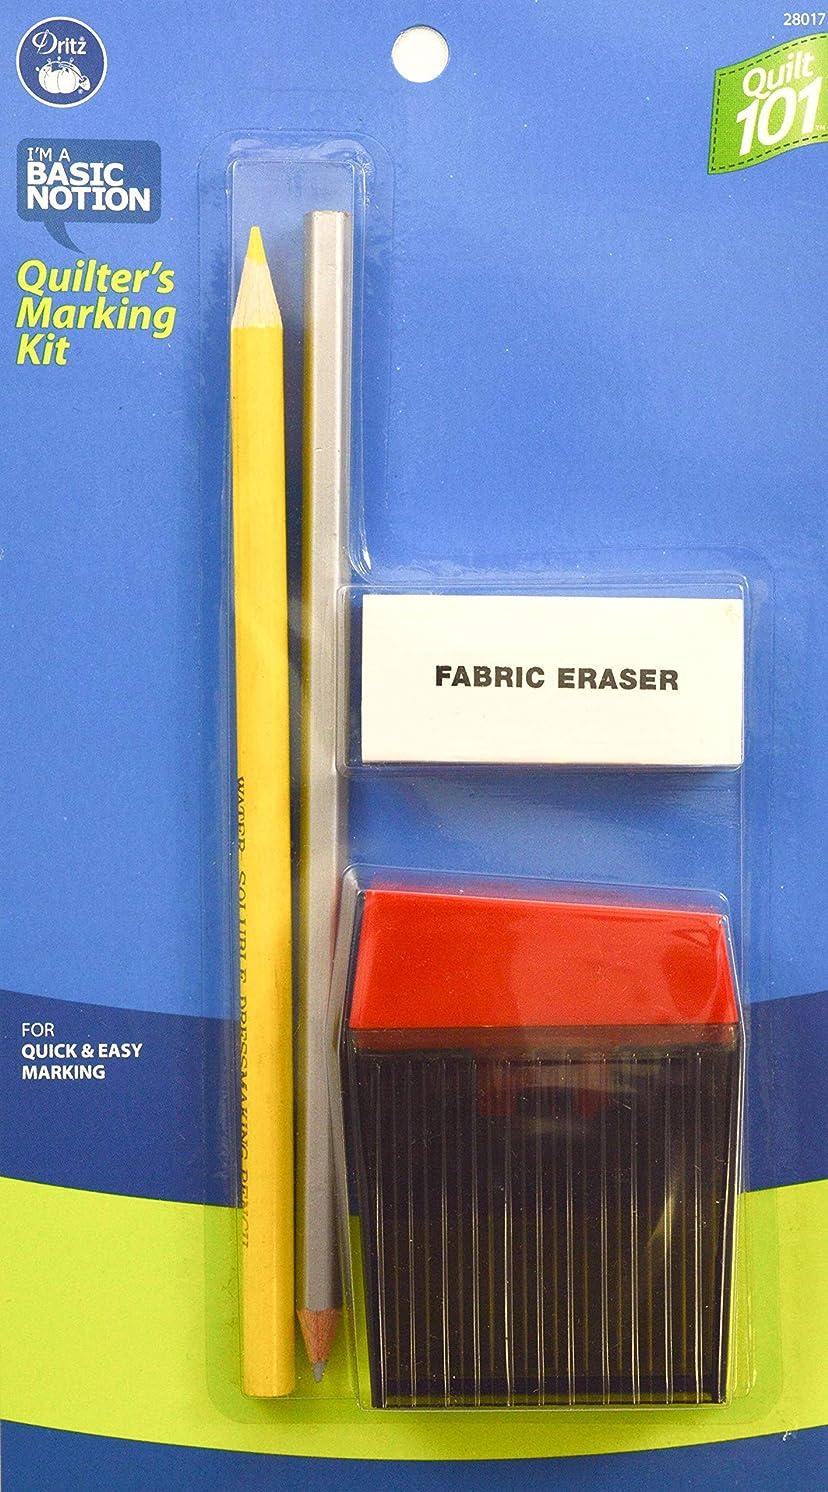 Dritz Quilt 101 28017 Quilter's Marking Kit